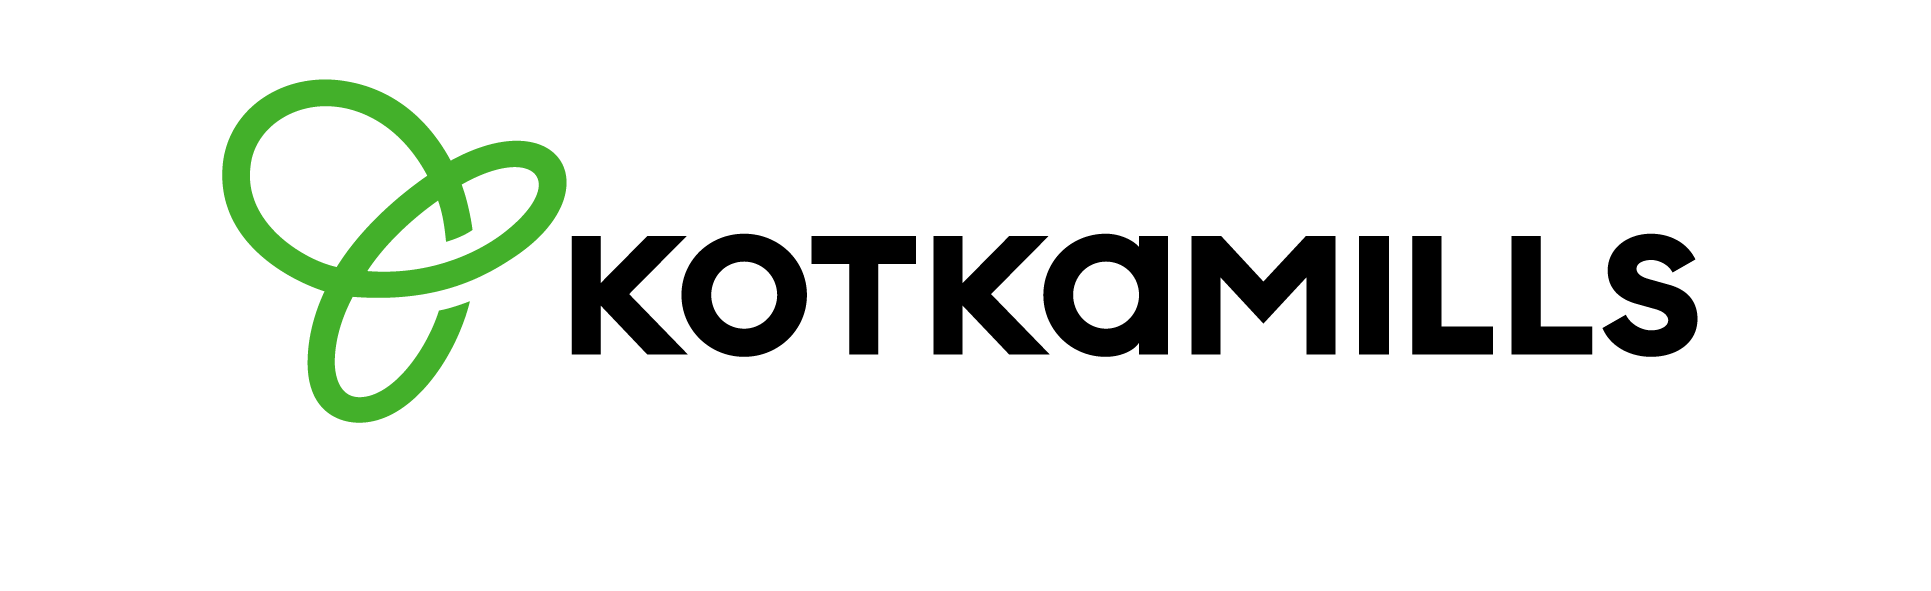 Kotkamills